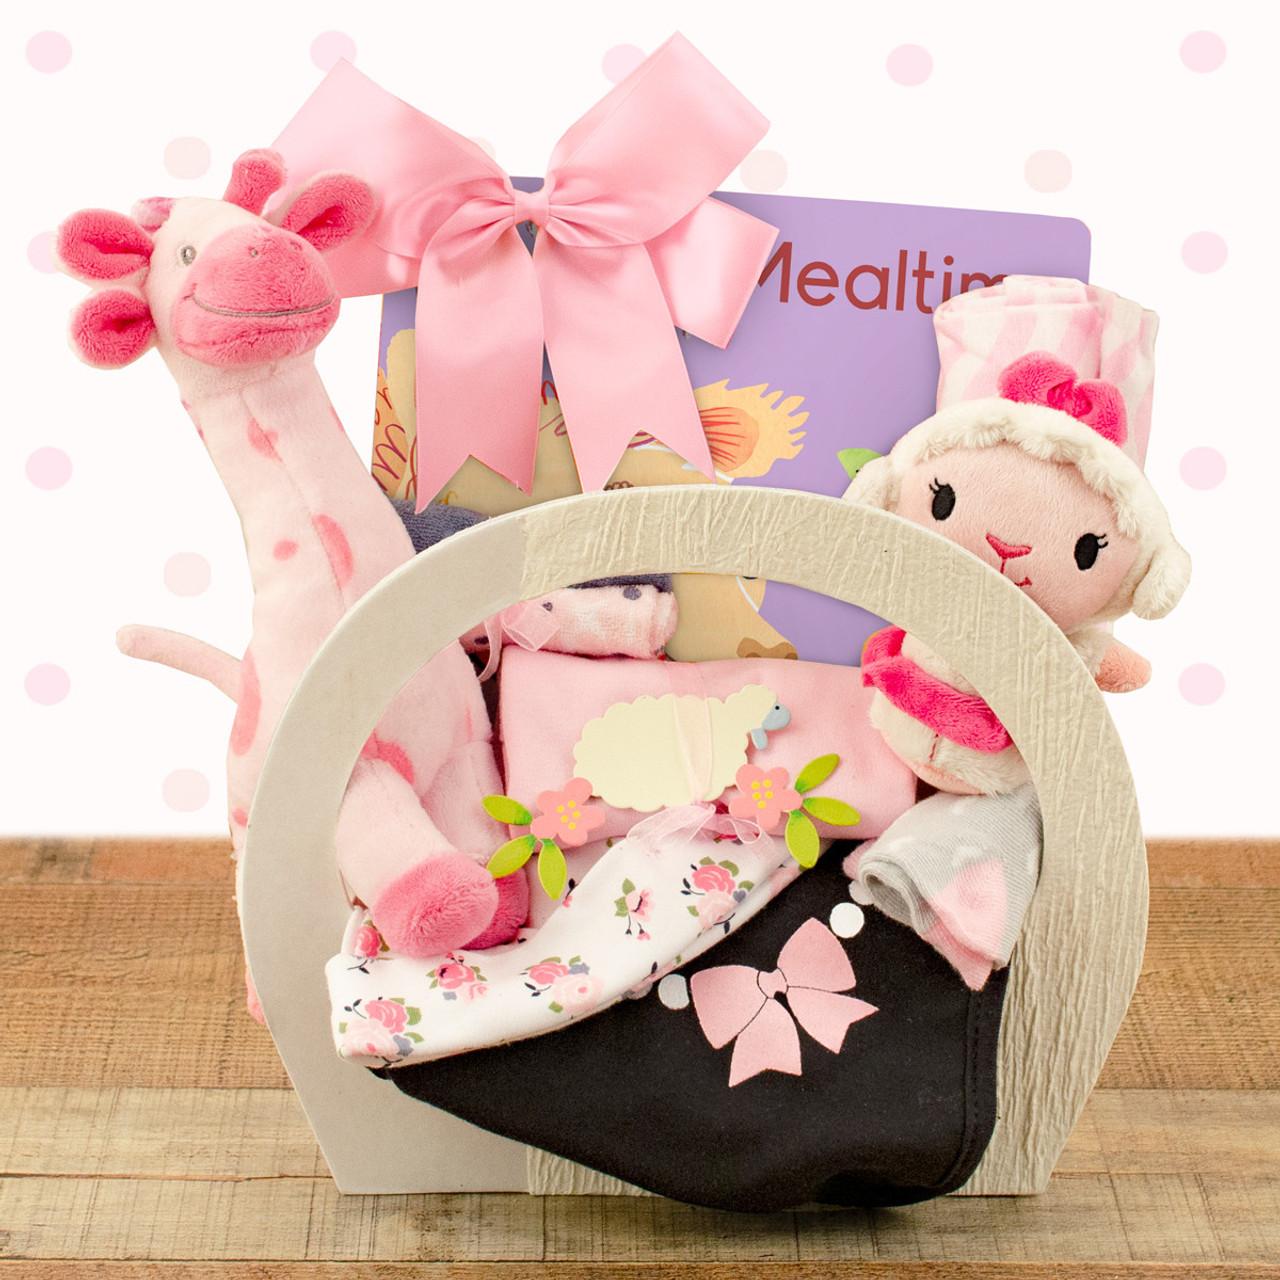 Image 0 of Baby Essentials: Baby Girl Gift Basket